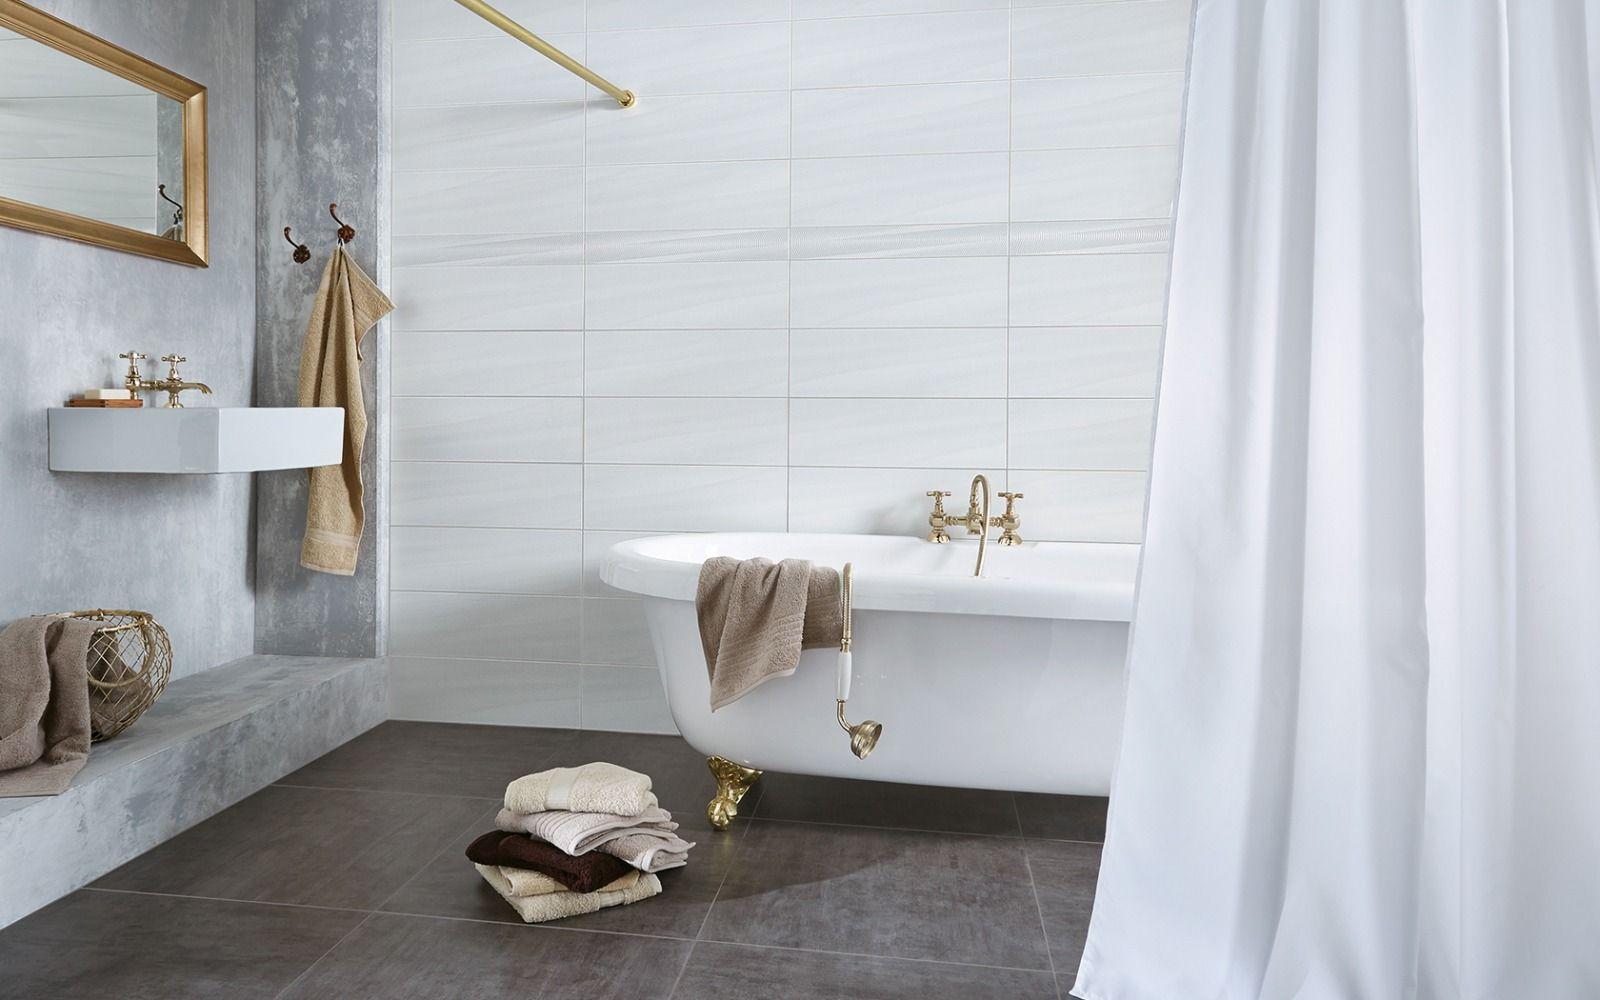 Badezimmer Deko ~ Grohn fliesen sheer #tiles #fliesen #badezimmer